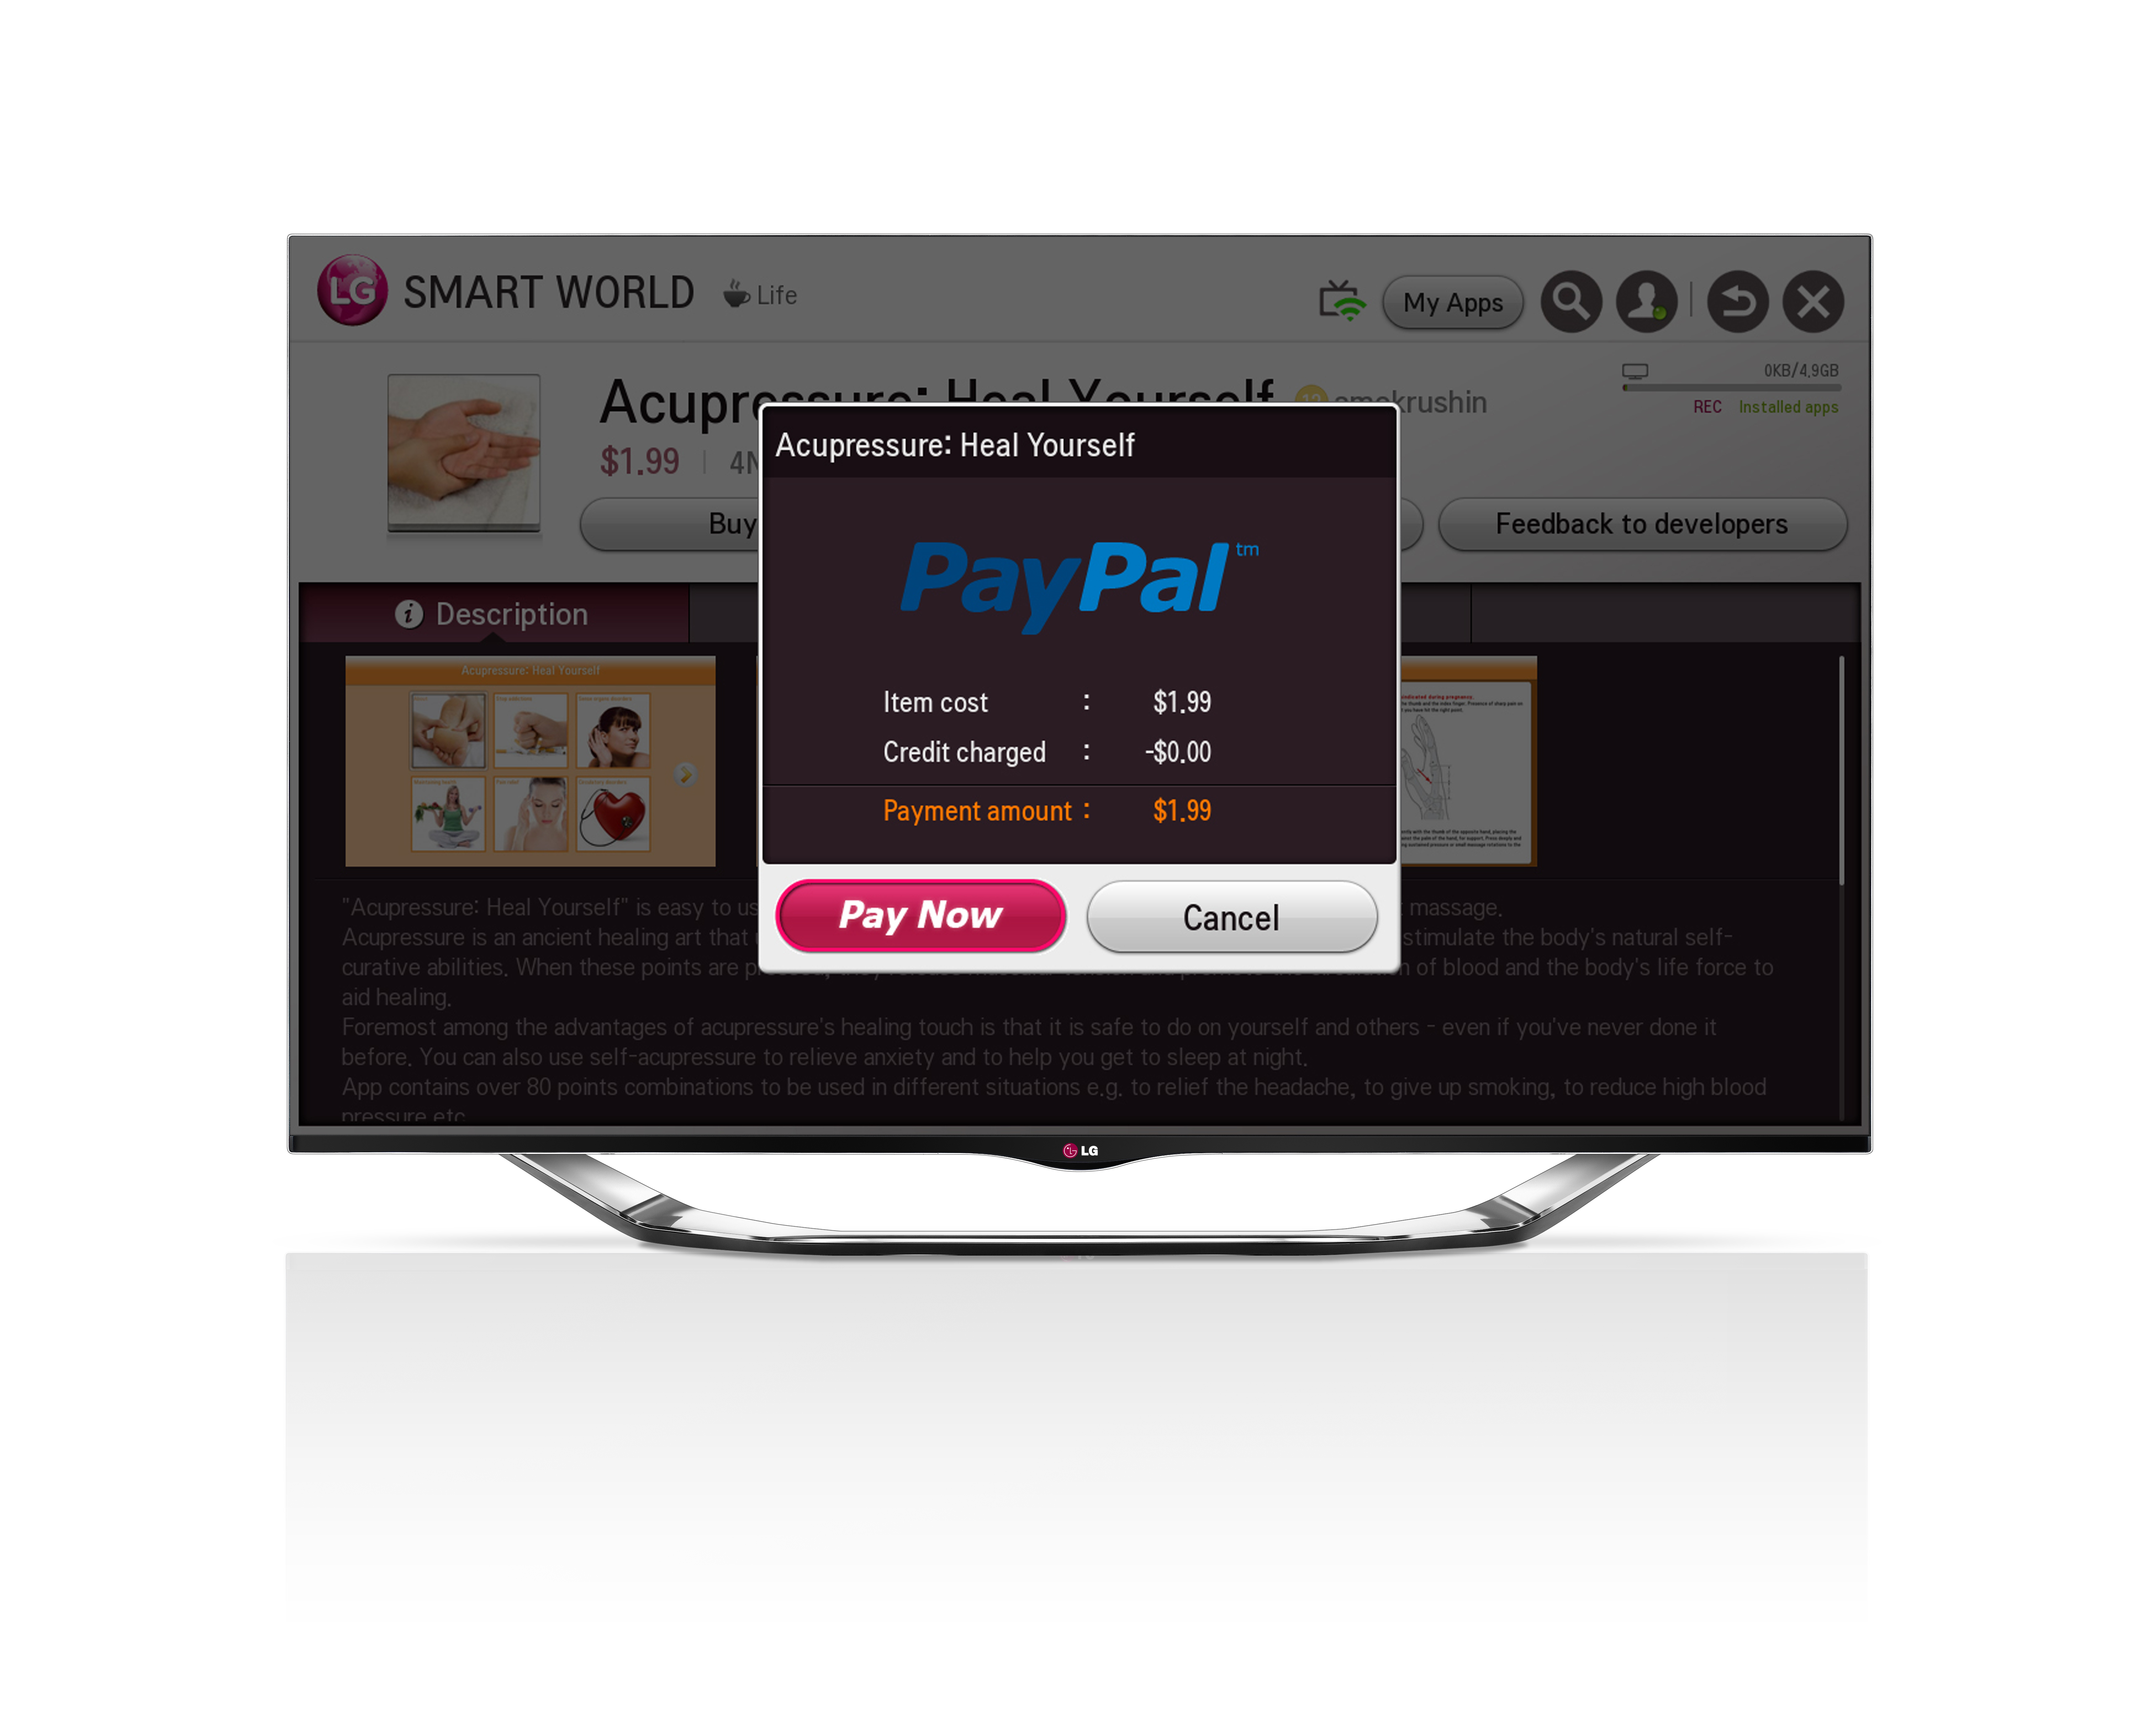 A Paypal pop-up on LG's Smart TV platform